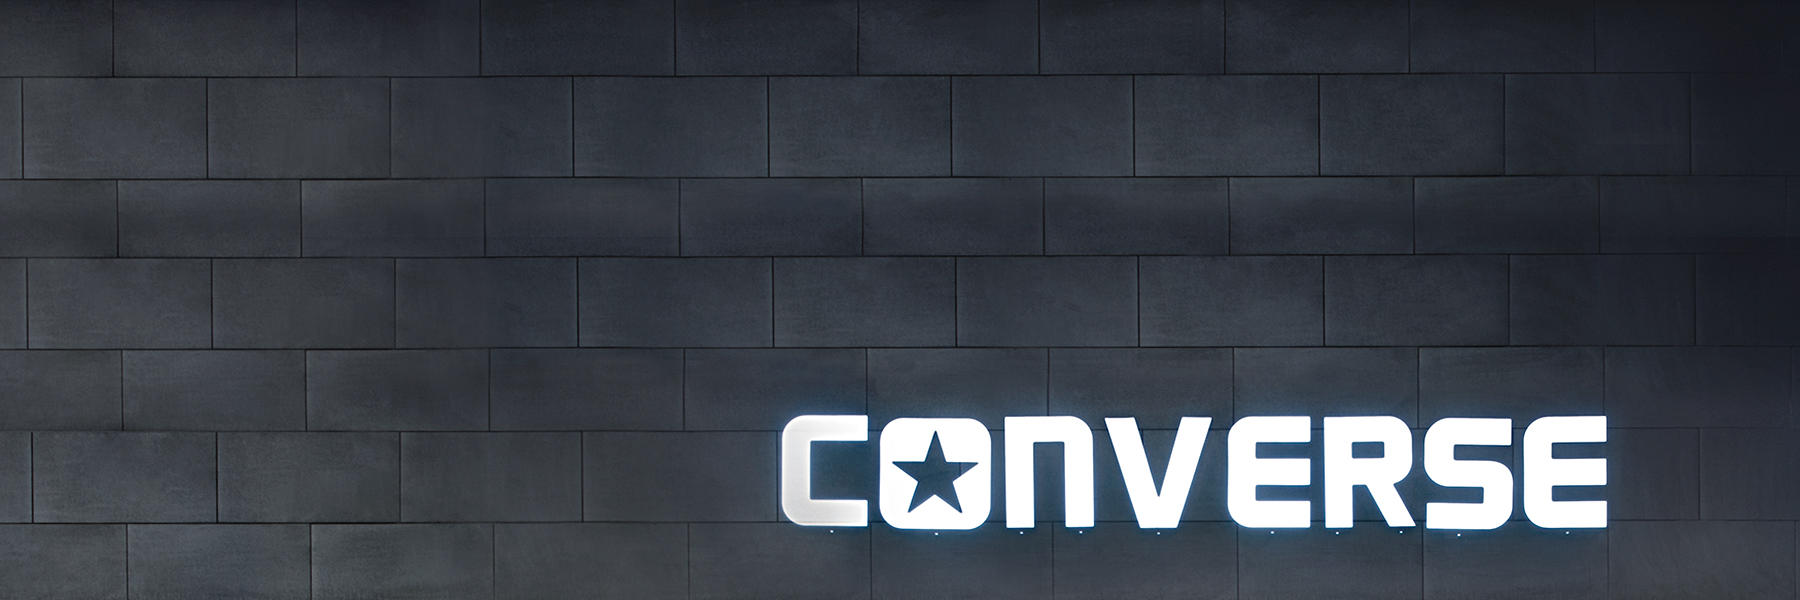 Converse Factory Pismo Beach Premium Outlets Ca Nike